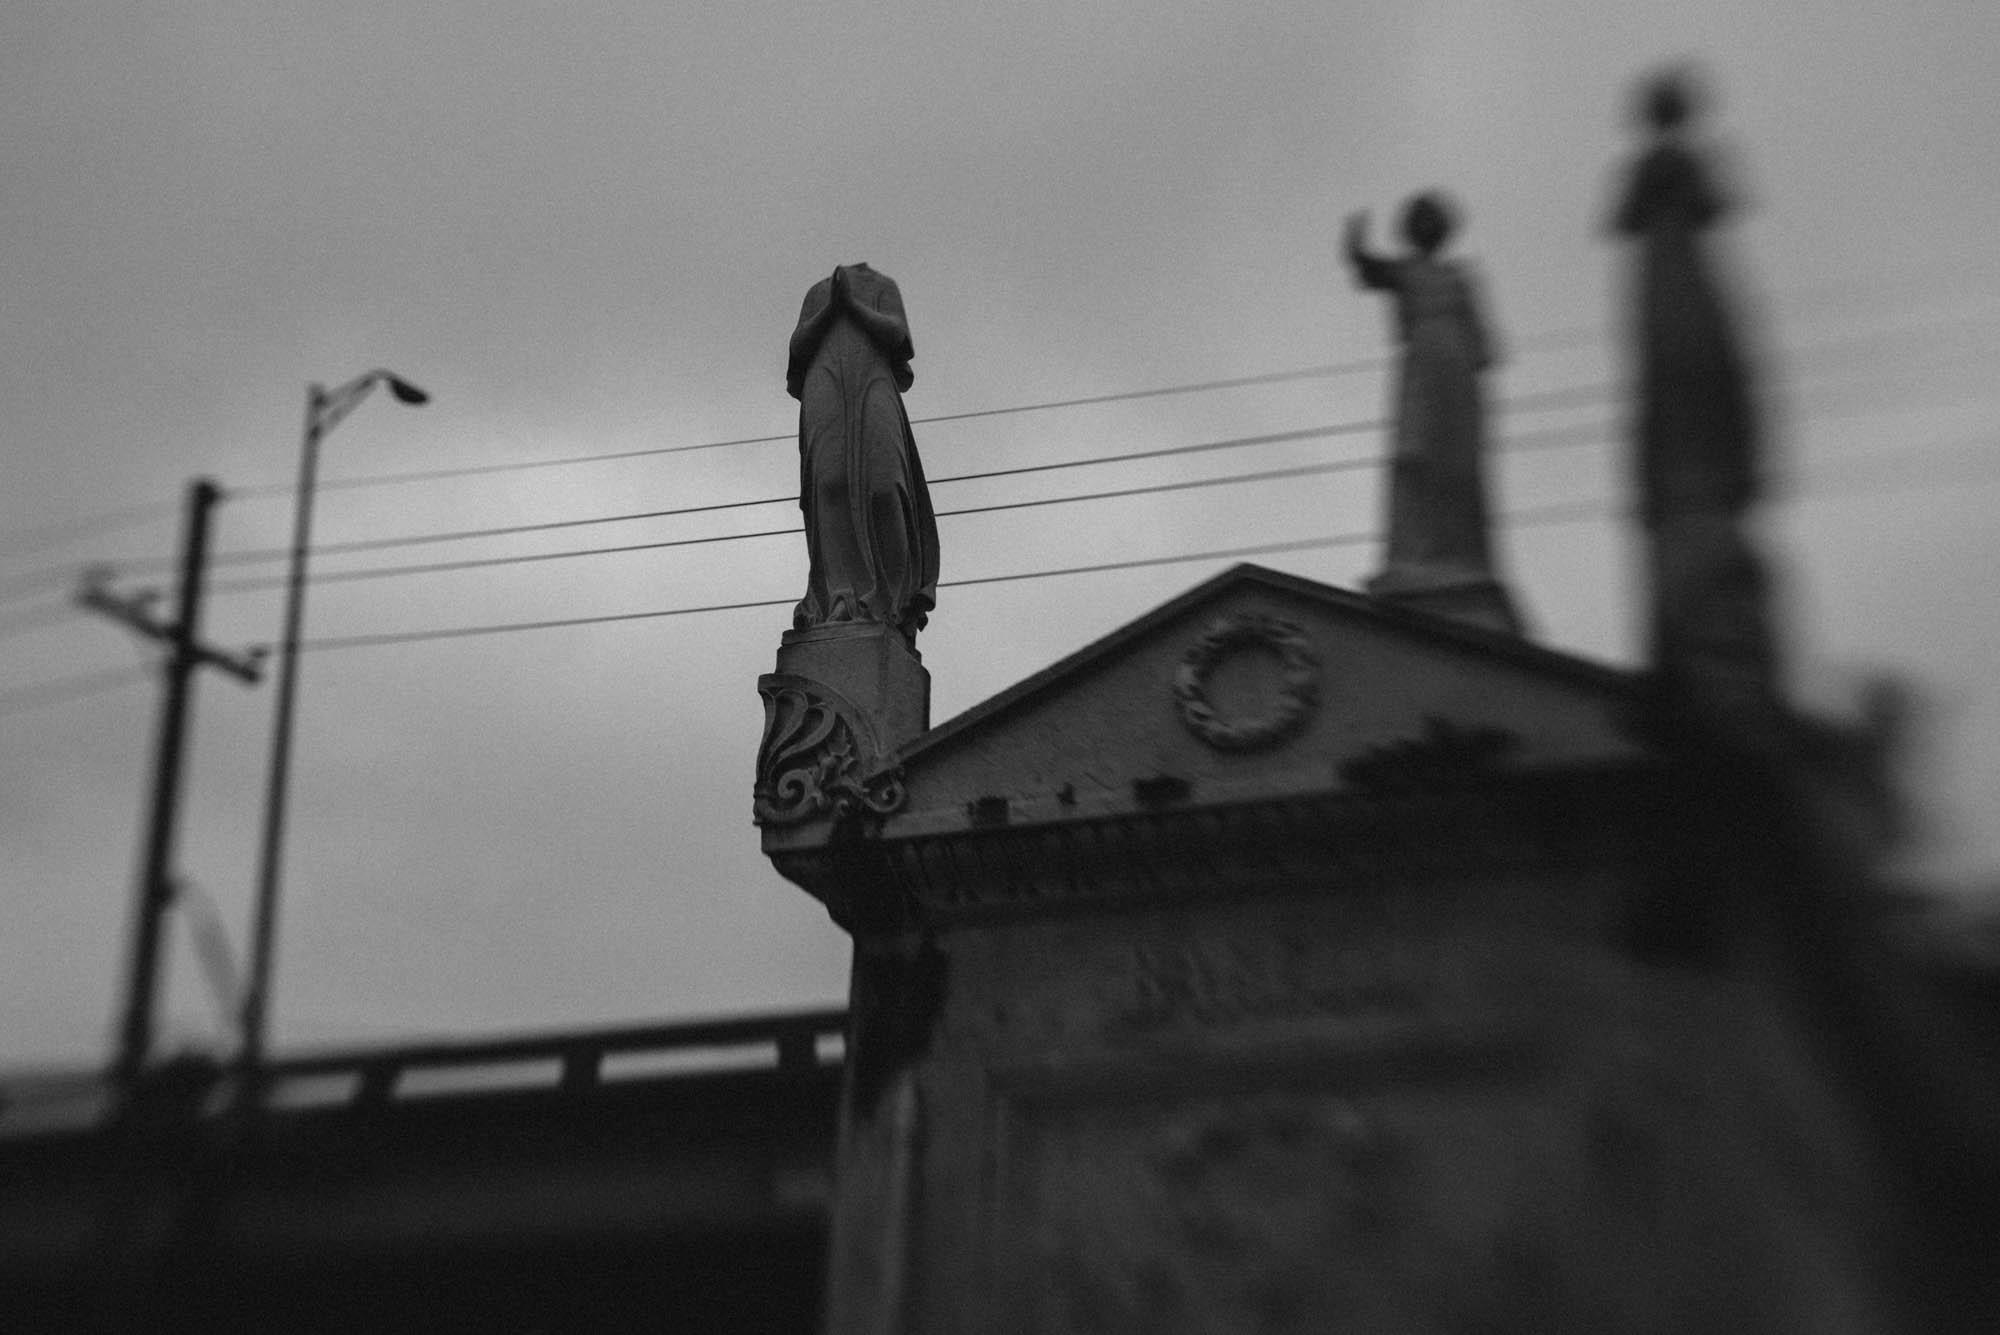 Carlos_Detres_Photography_Brugal_ForWeb_20150314_0481.jpg